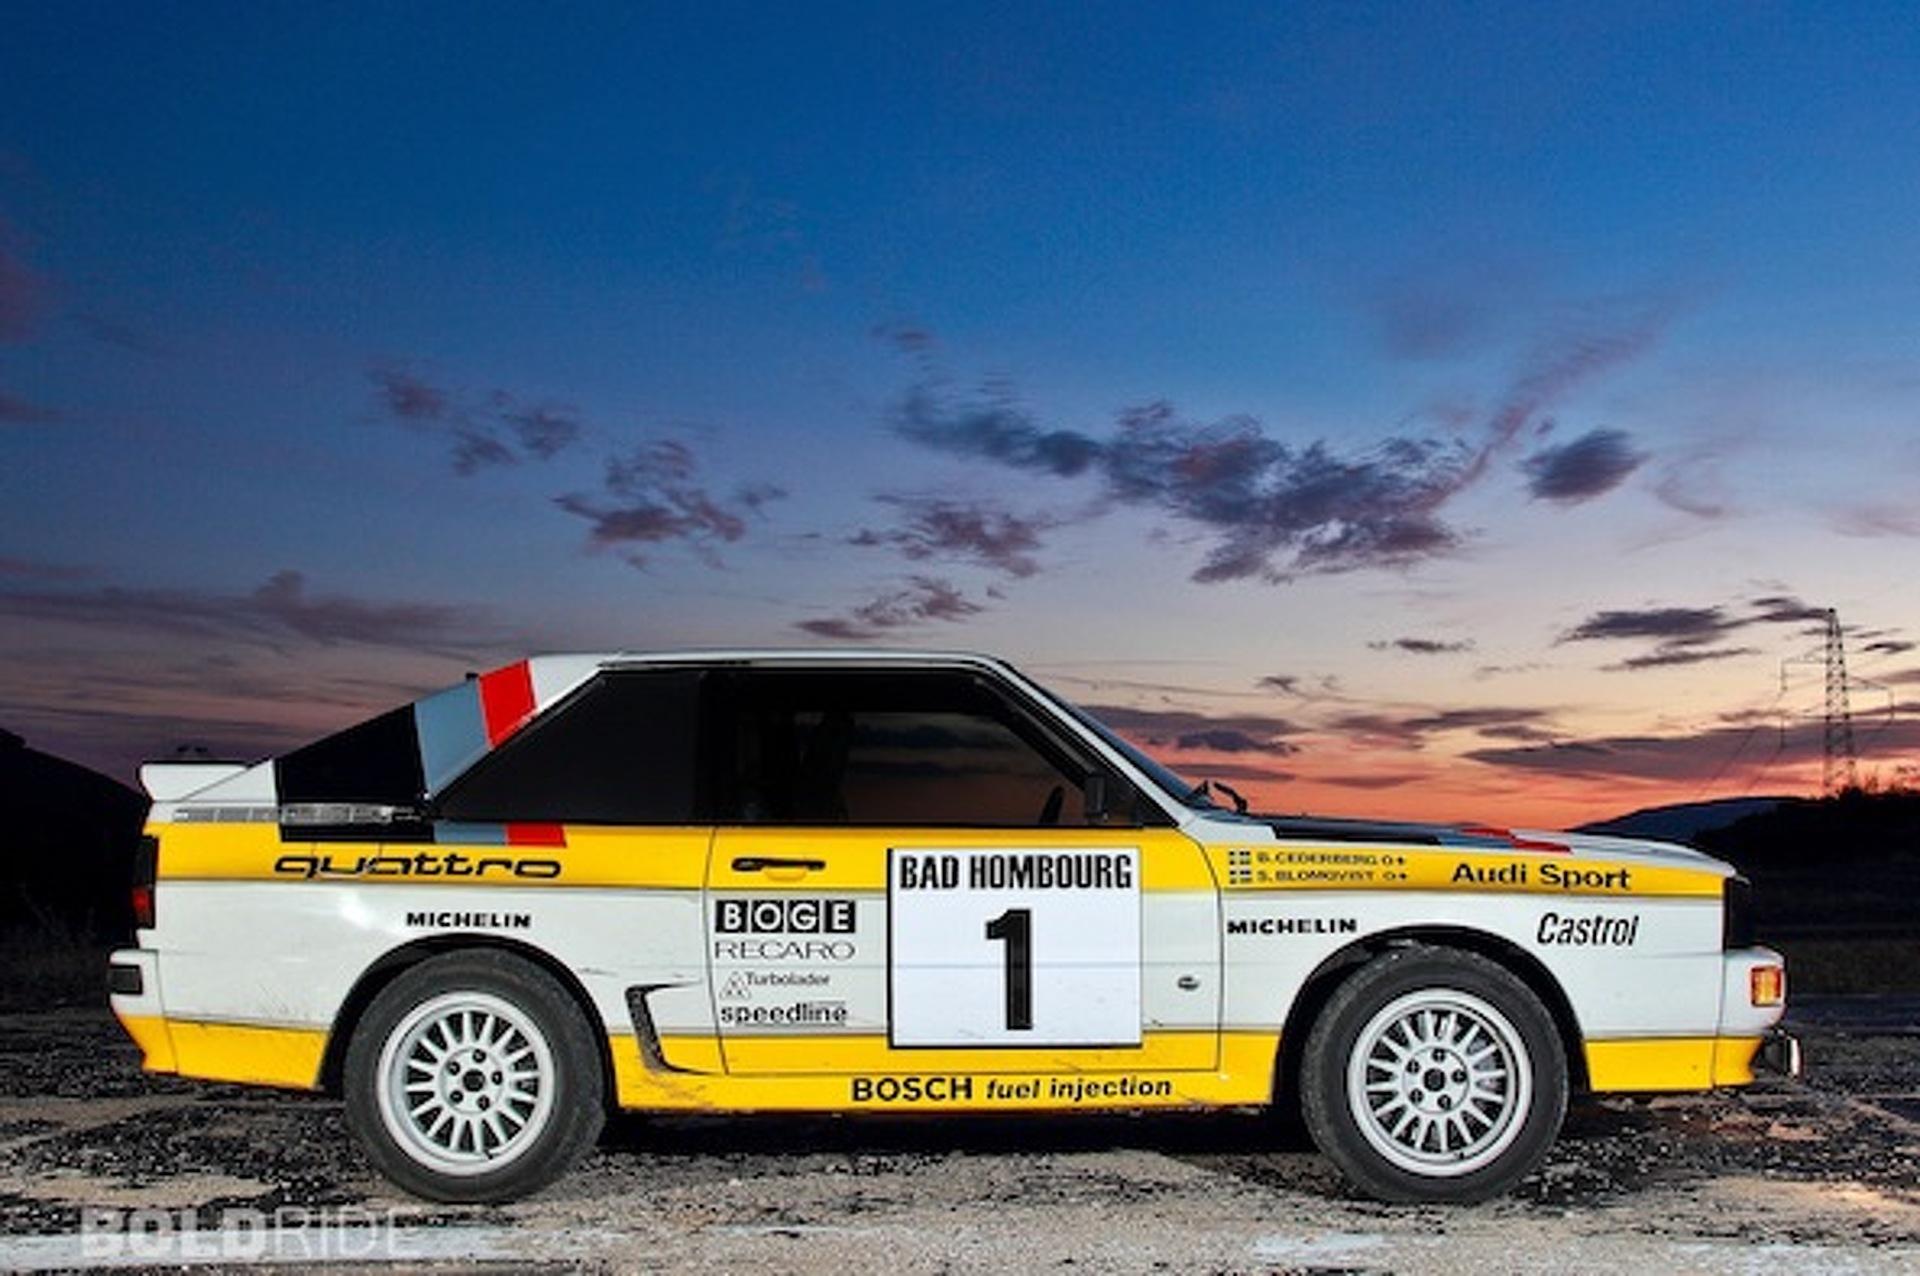 wheels wallpaper 1985 audi quattro group b rally car. Black Bedroom Furniture Sets. Home Design Ideas